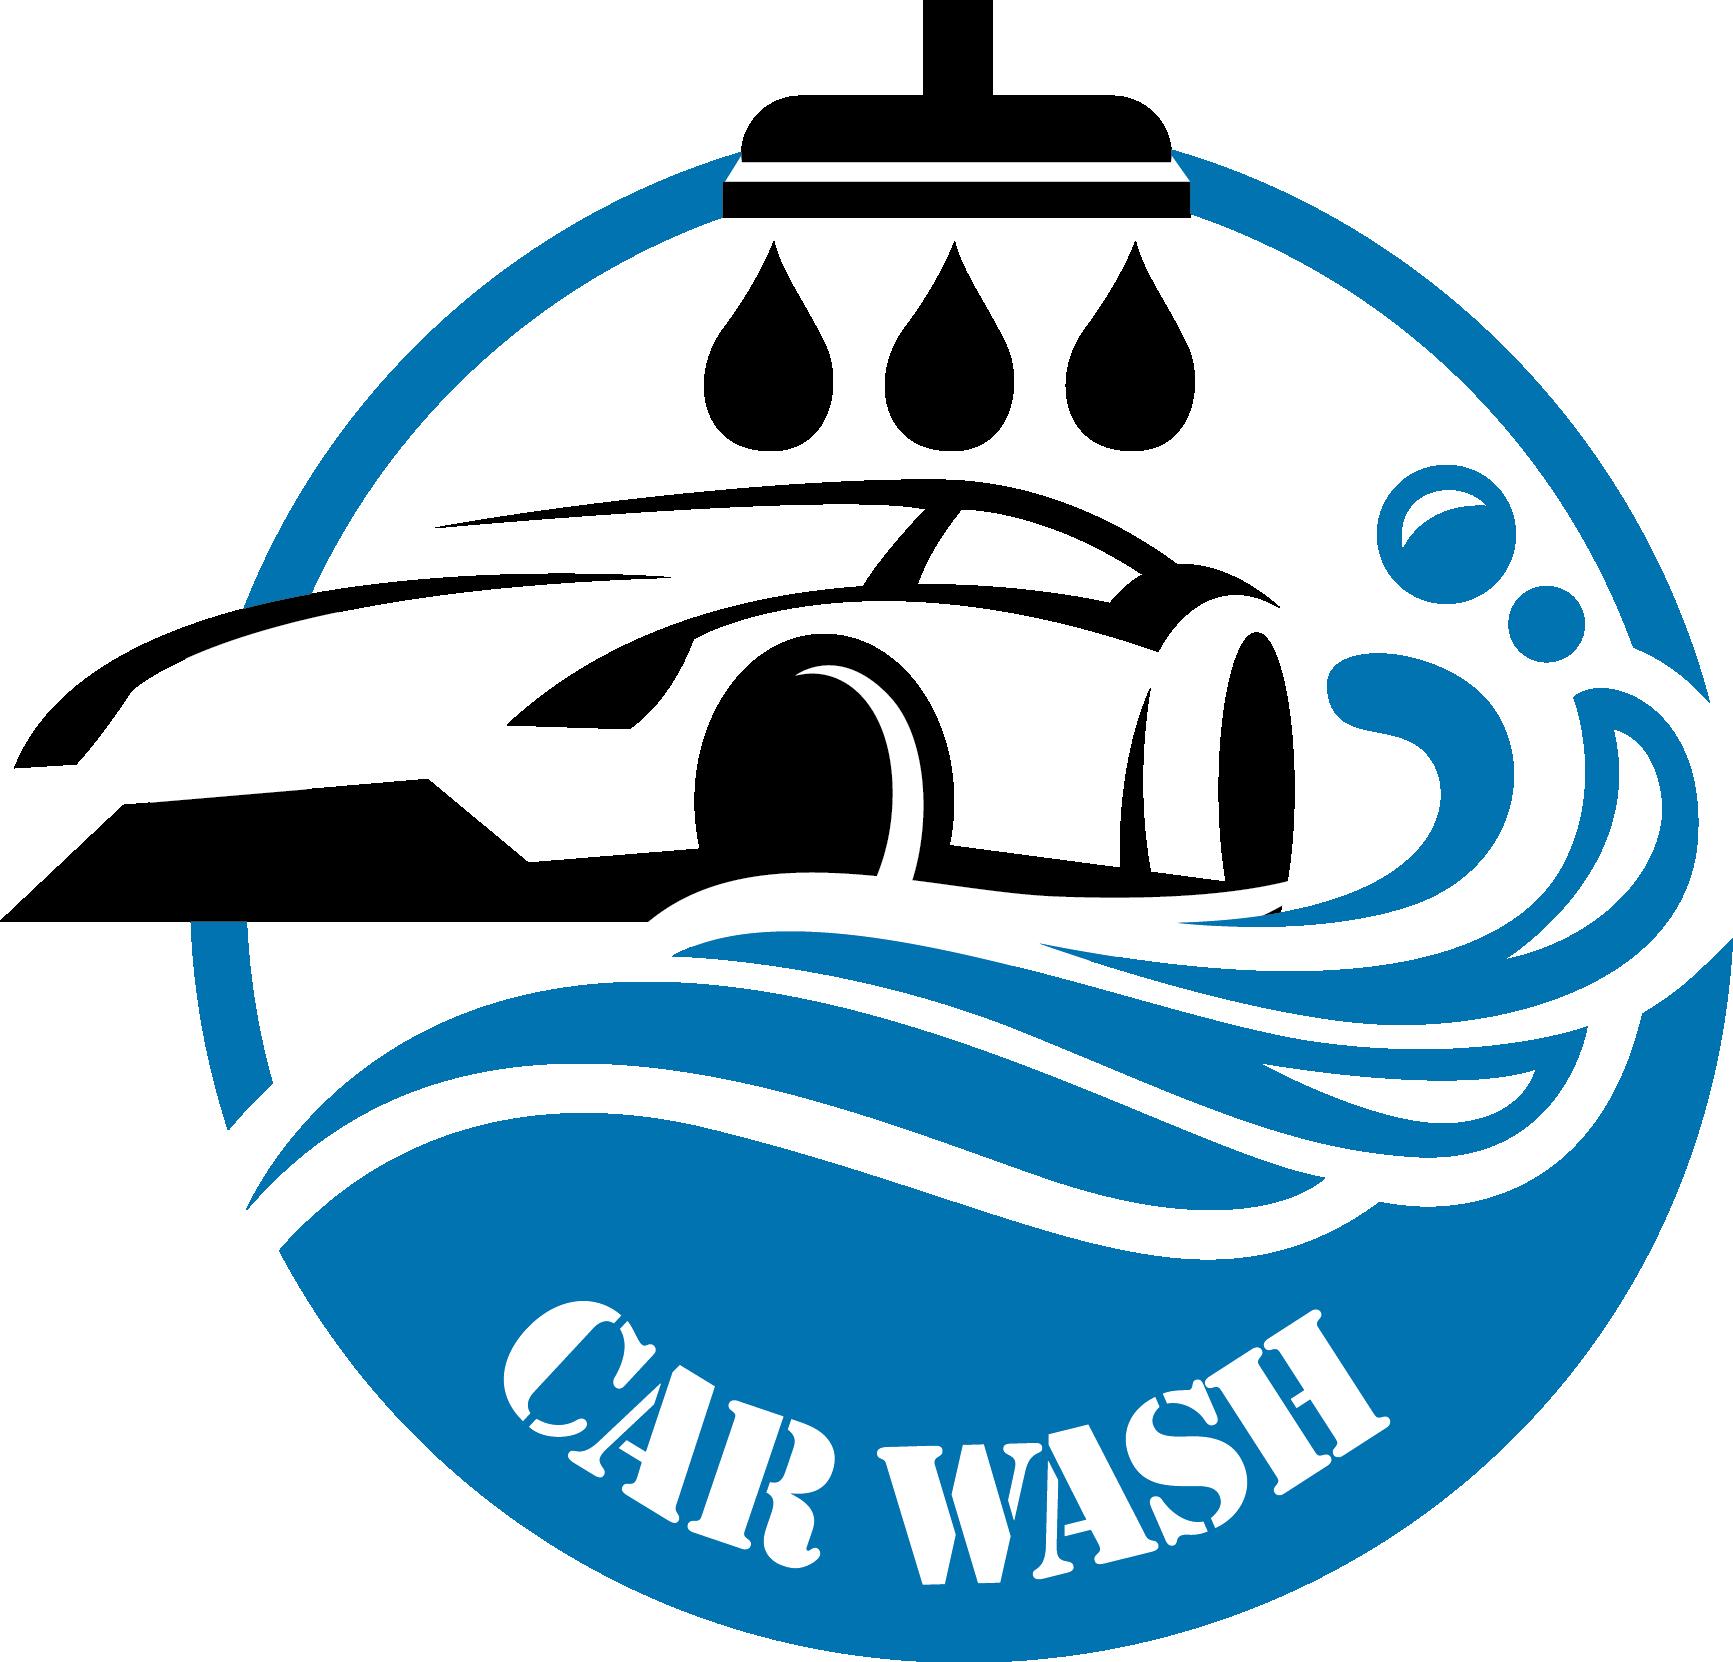 Guy clipart car wash. At getdrawings com free